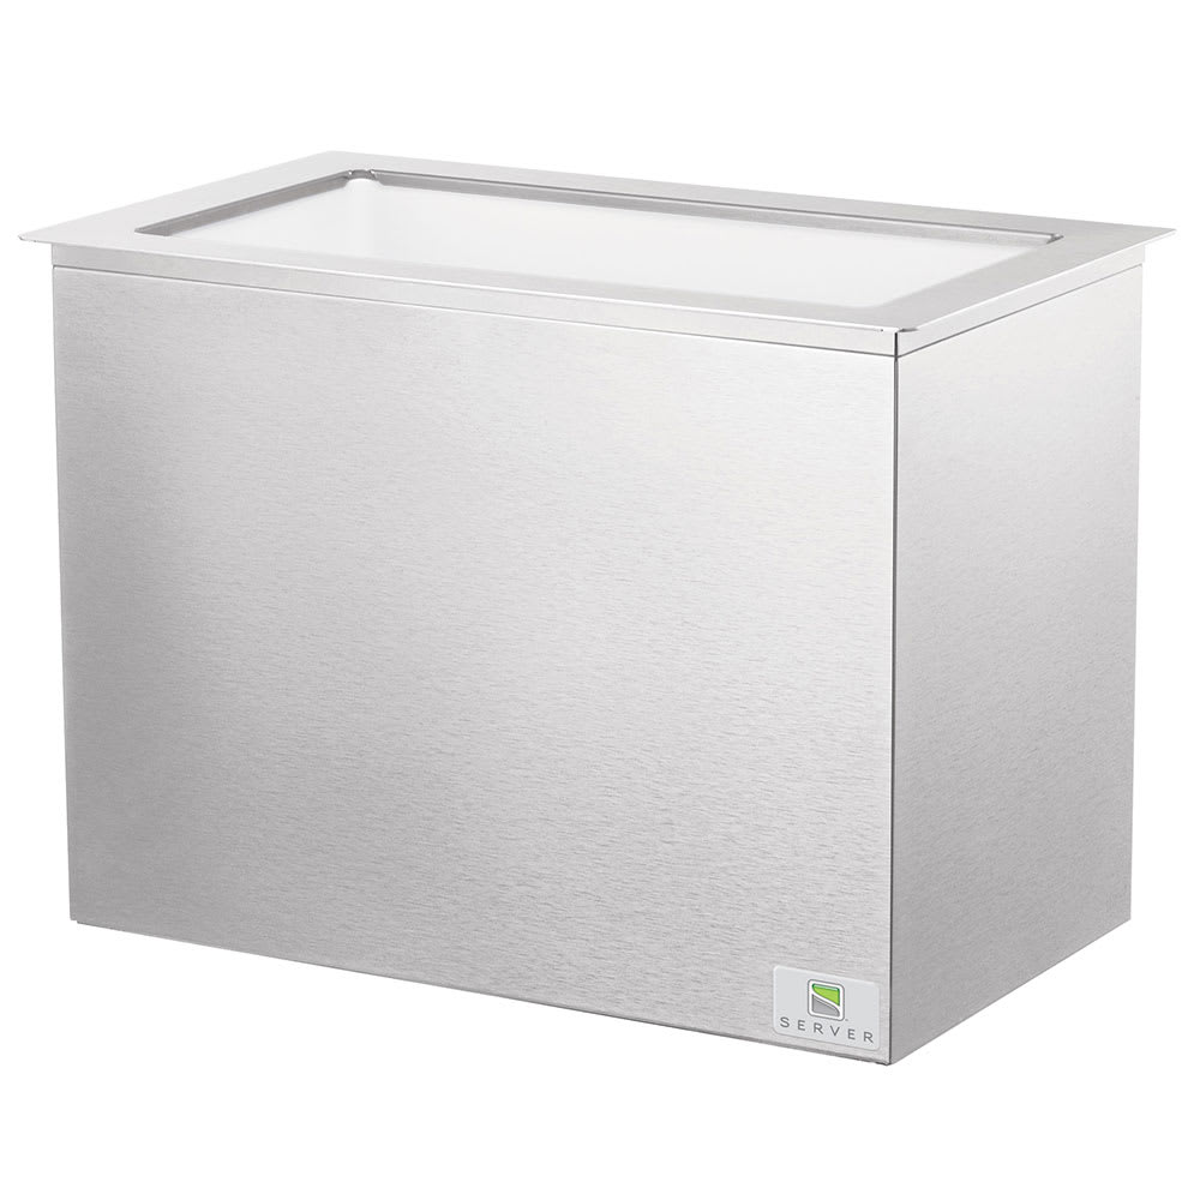 Server 83830 Serving Bar Base for (3) Standard Fountain Jars, Stainless